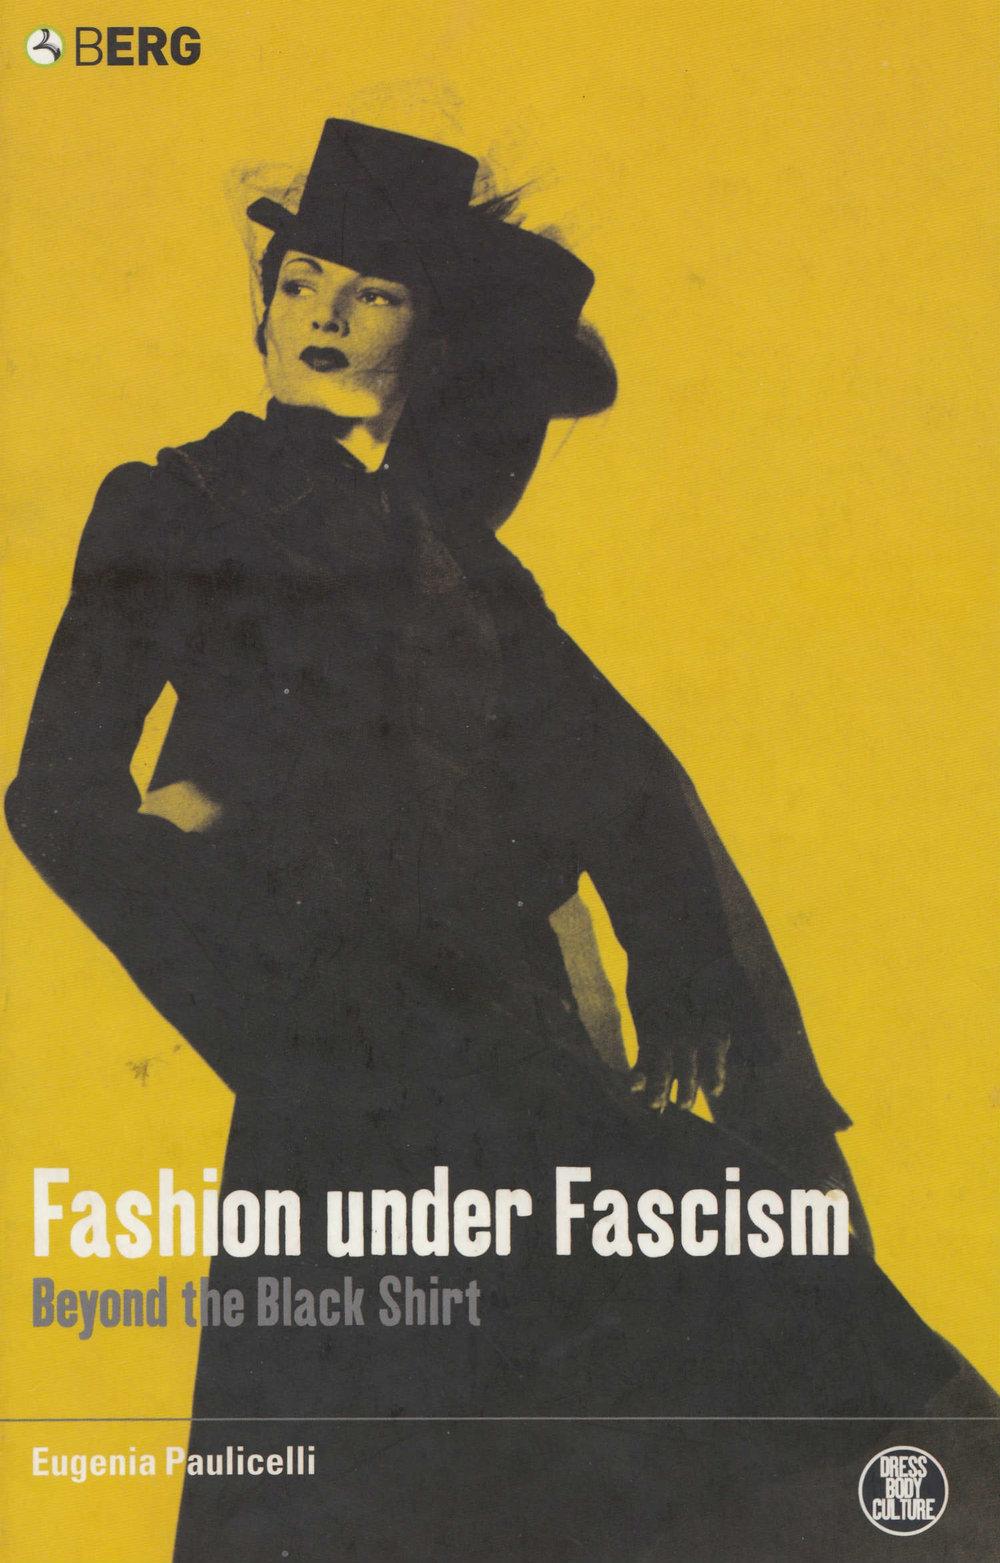 FashionUnderFascism_1 .jpg